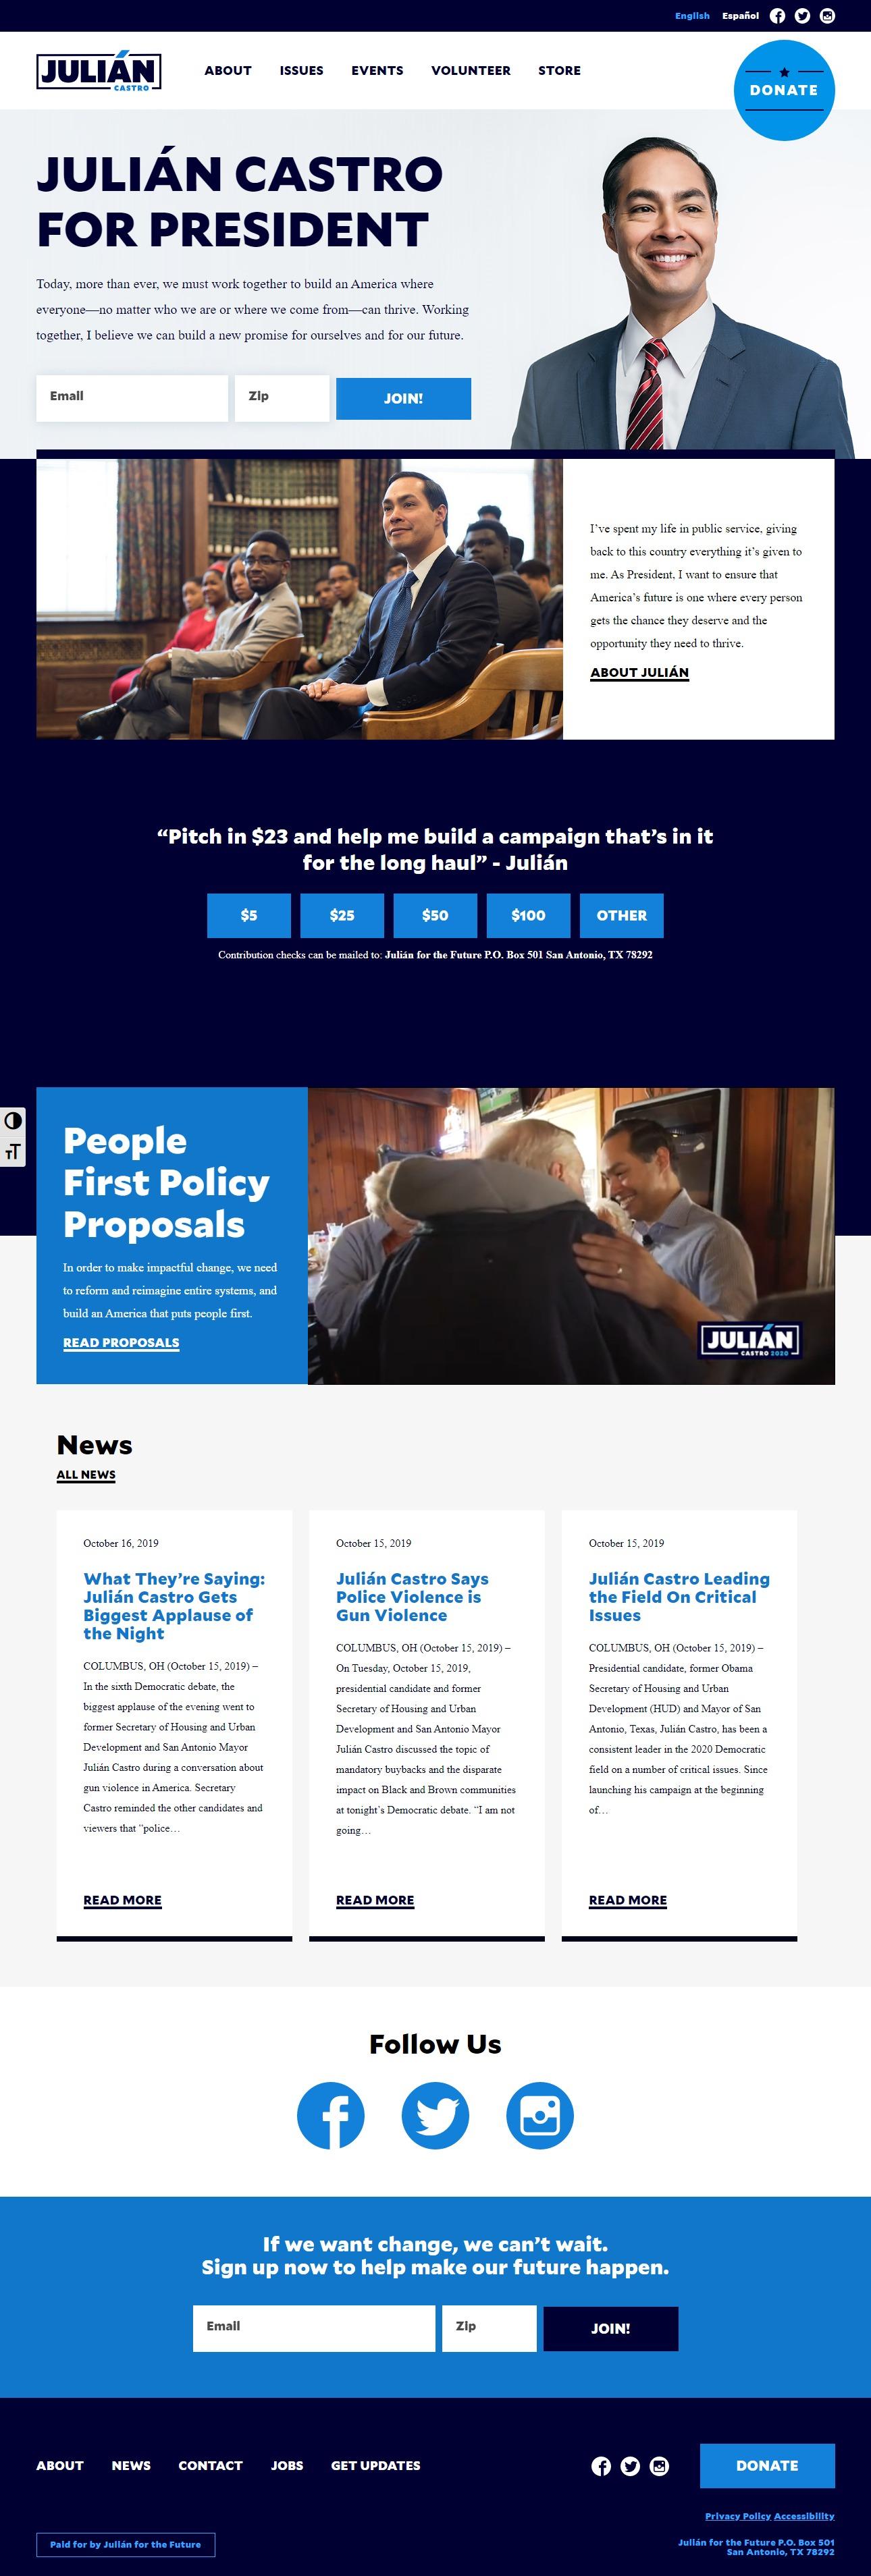 Homepage Snapshot for December 1, 2019: Former Mayor Julián Castro